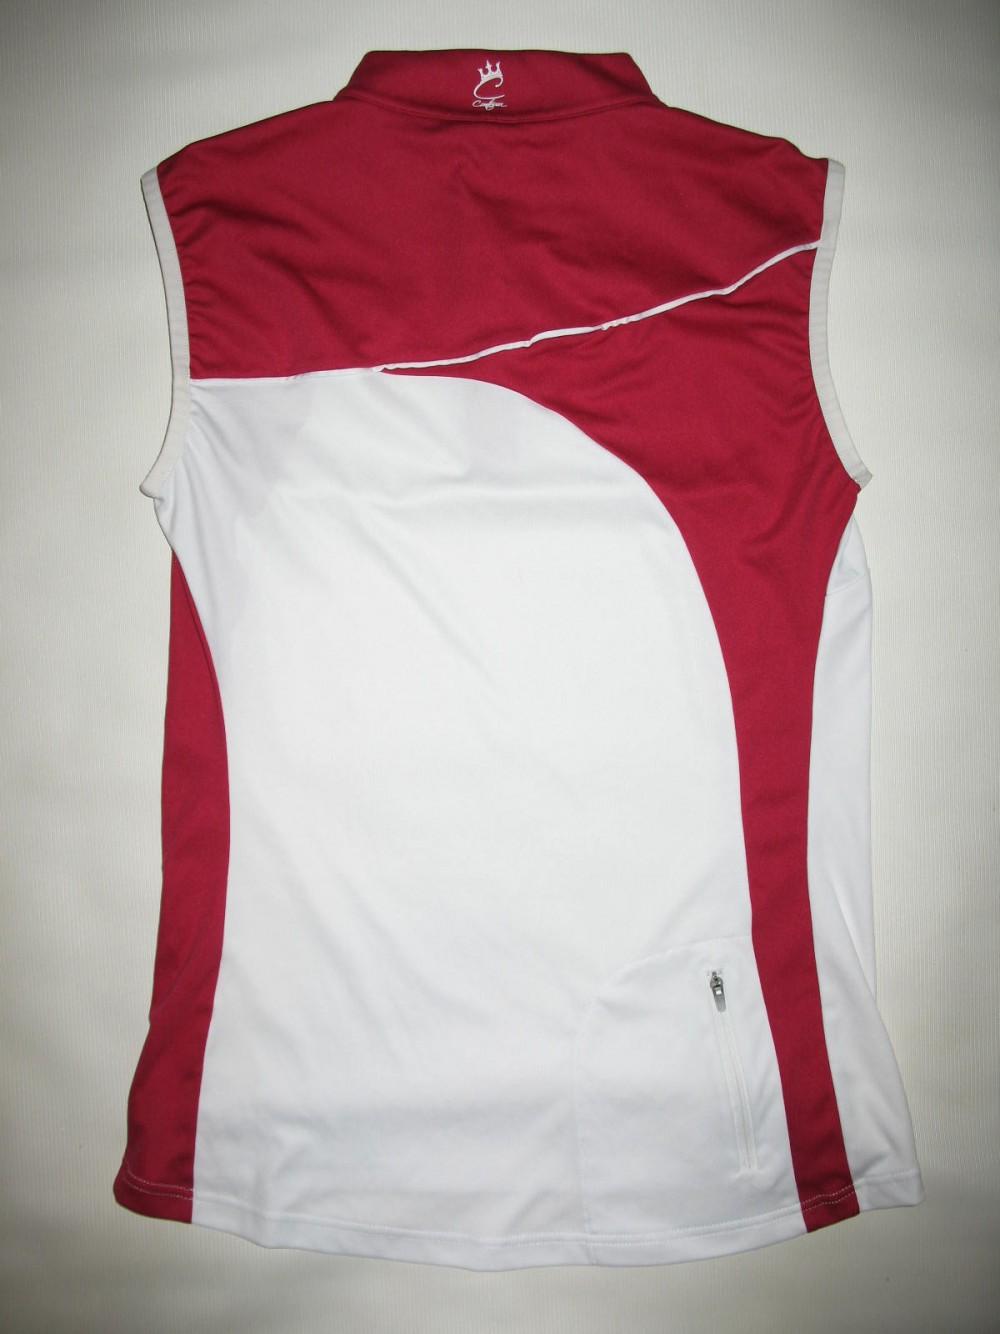 Веломайка SCOTT contessa ss jersey lady (размер L) - 1